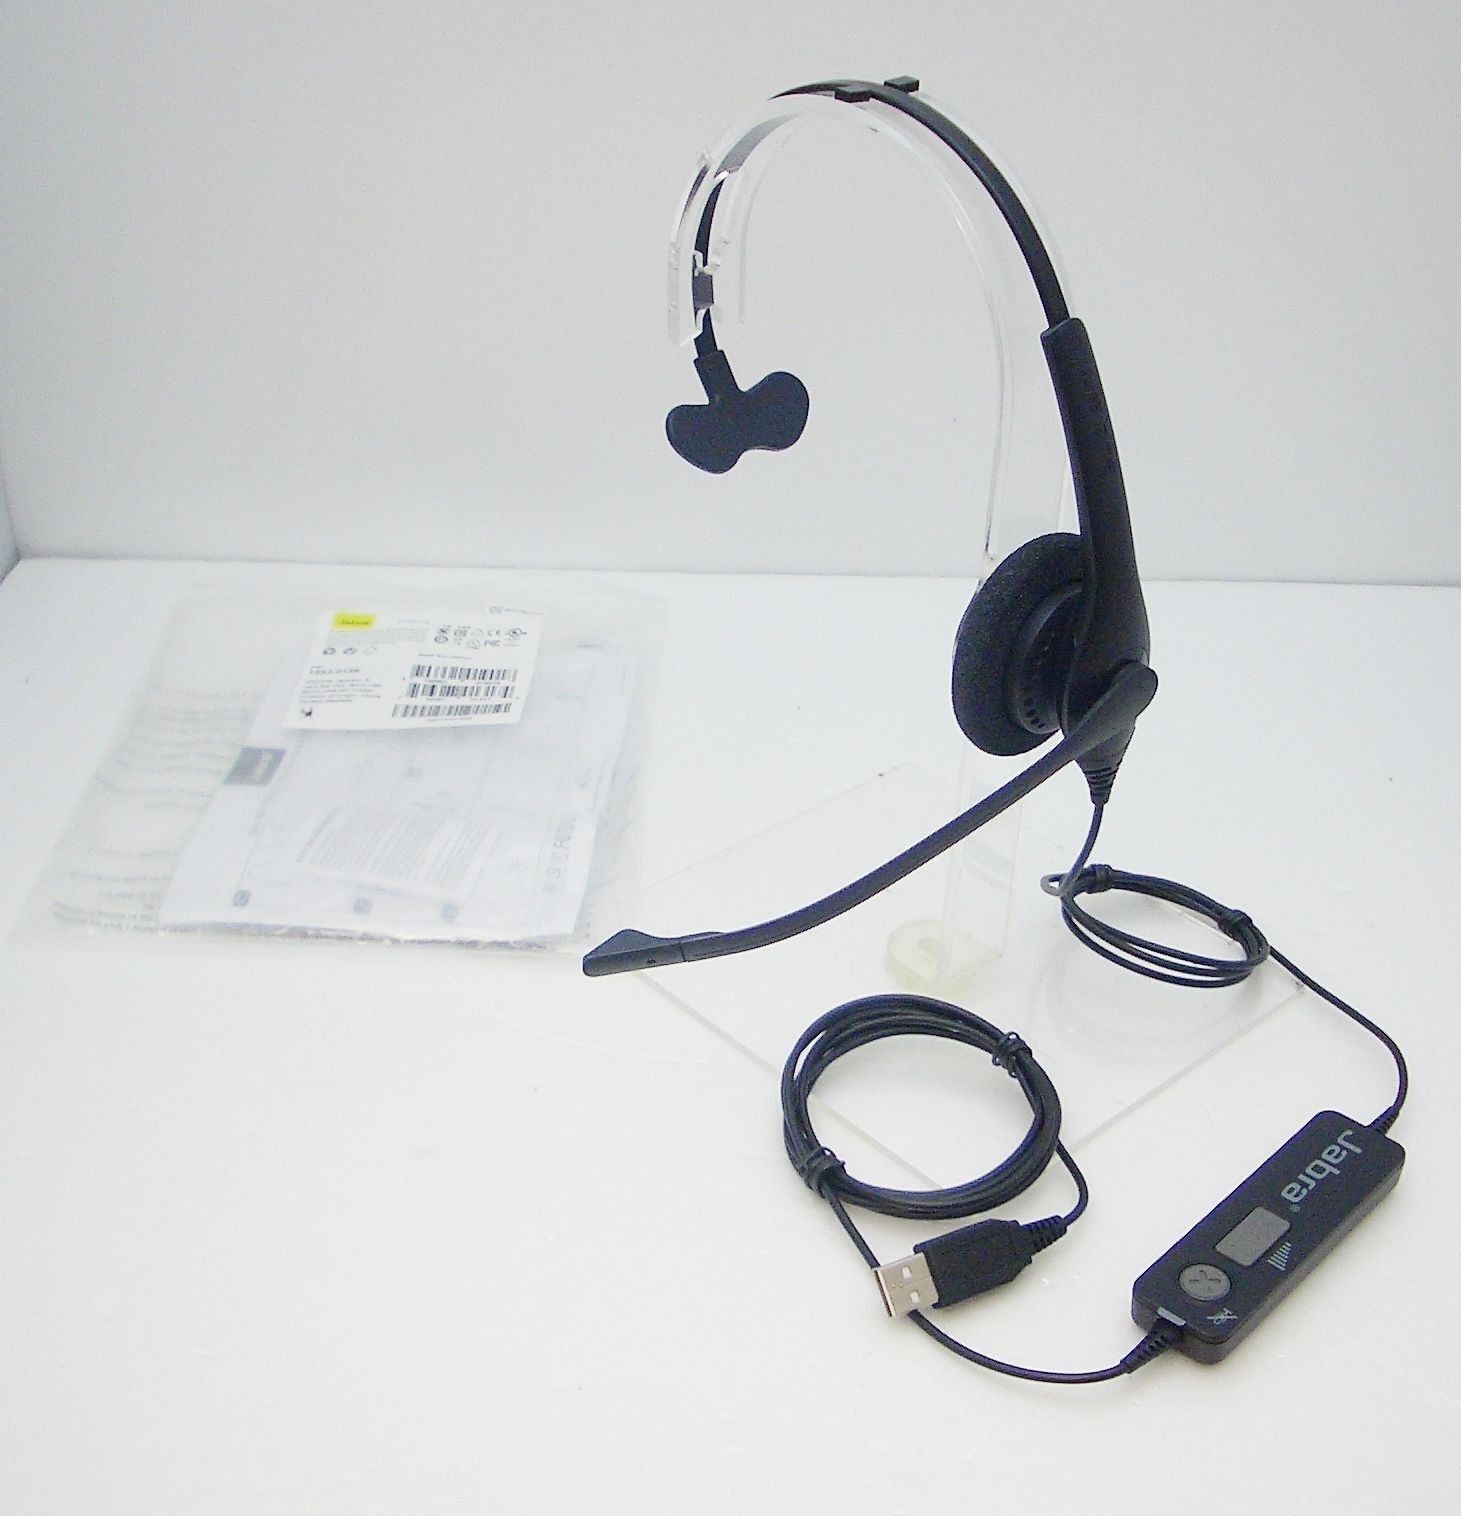 Jabra BIZ 1500 USB Mono Corded Headset 1553-0159 w// Noise Canceling Microphone